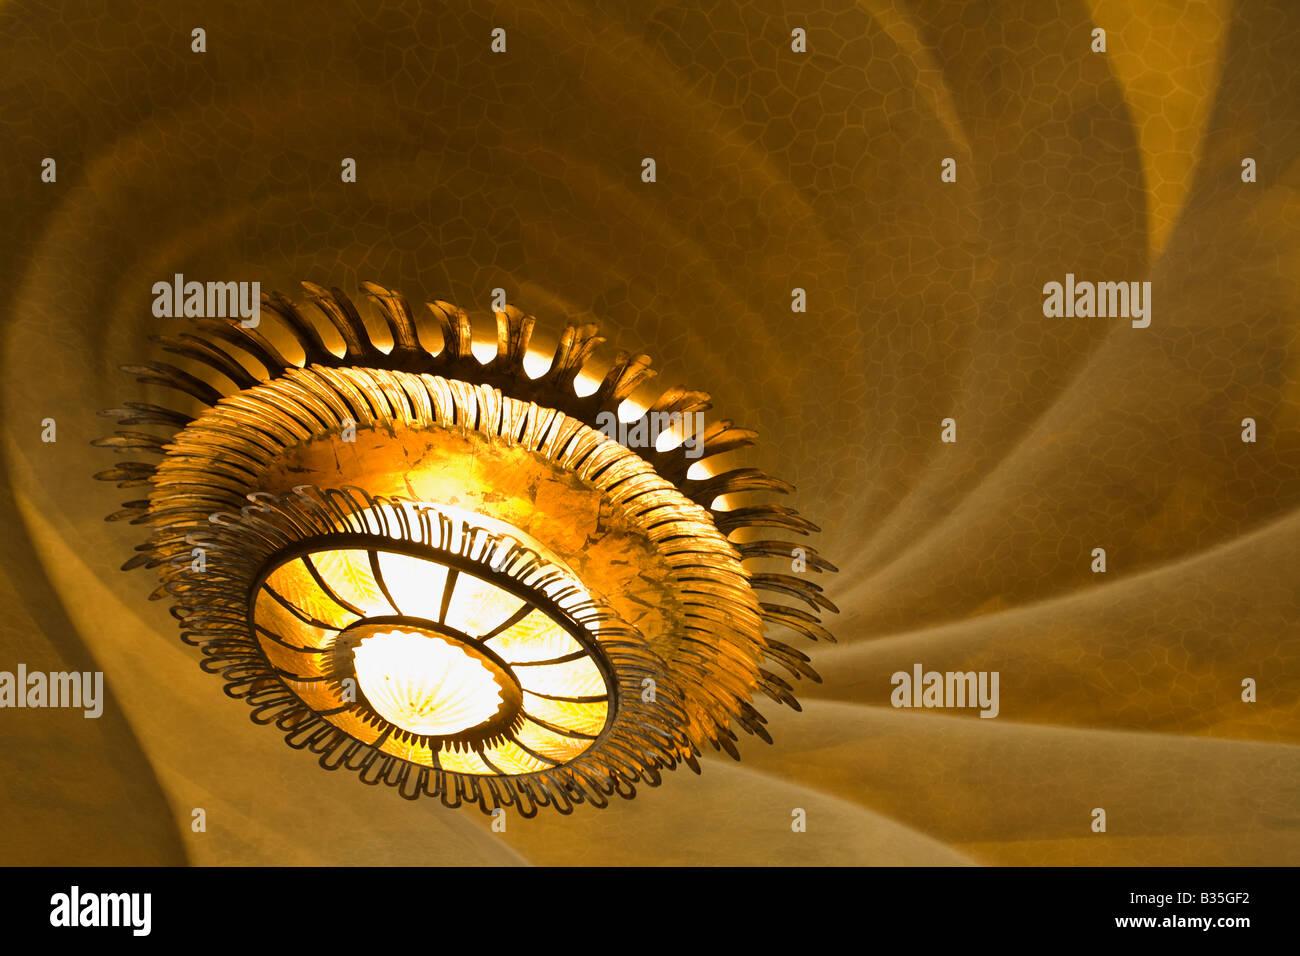 SPAIN Barcelona Metal light fixture in Casa Batllo designed Antoni Gaudi architect Modernisme architecture curved - Stock Image